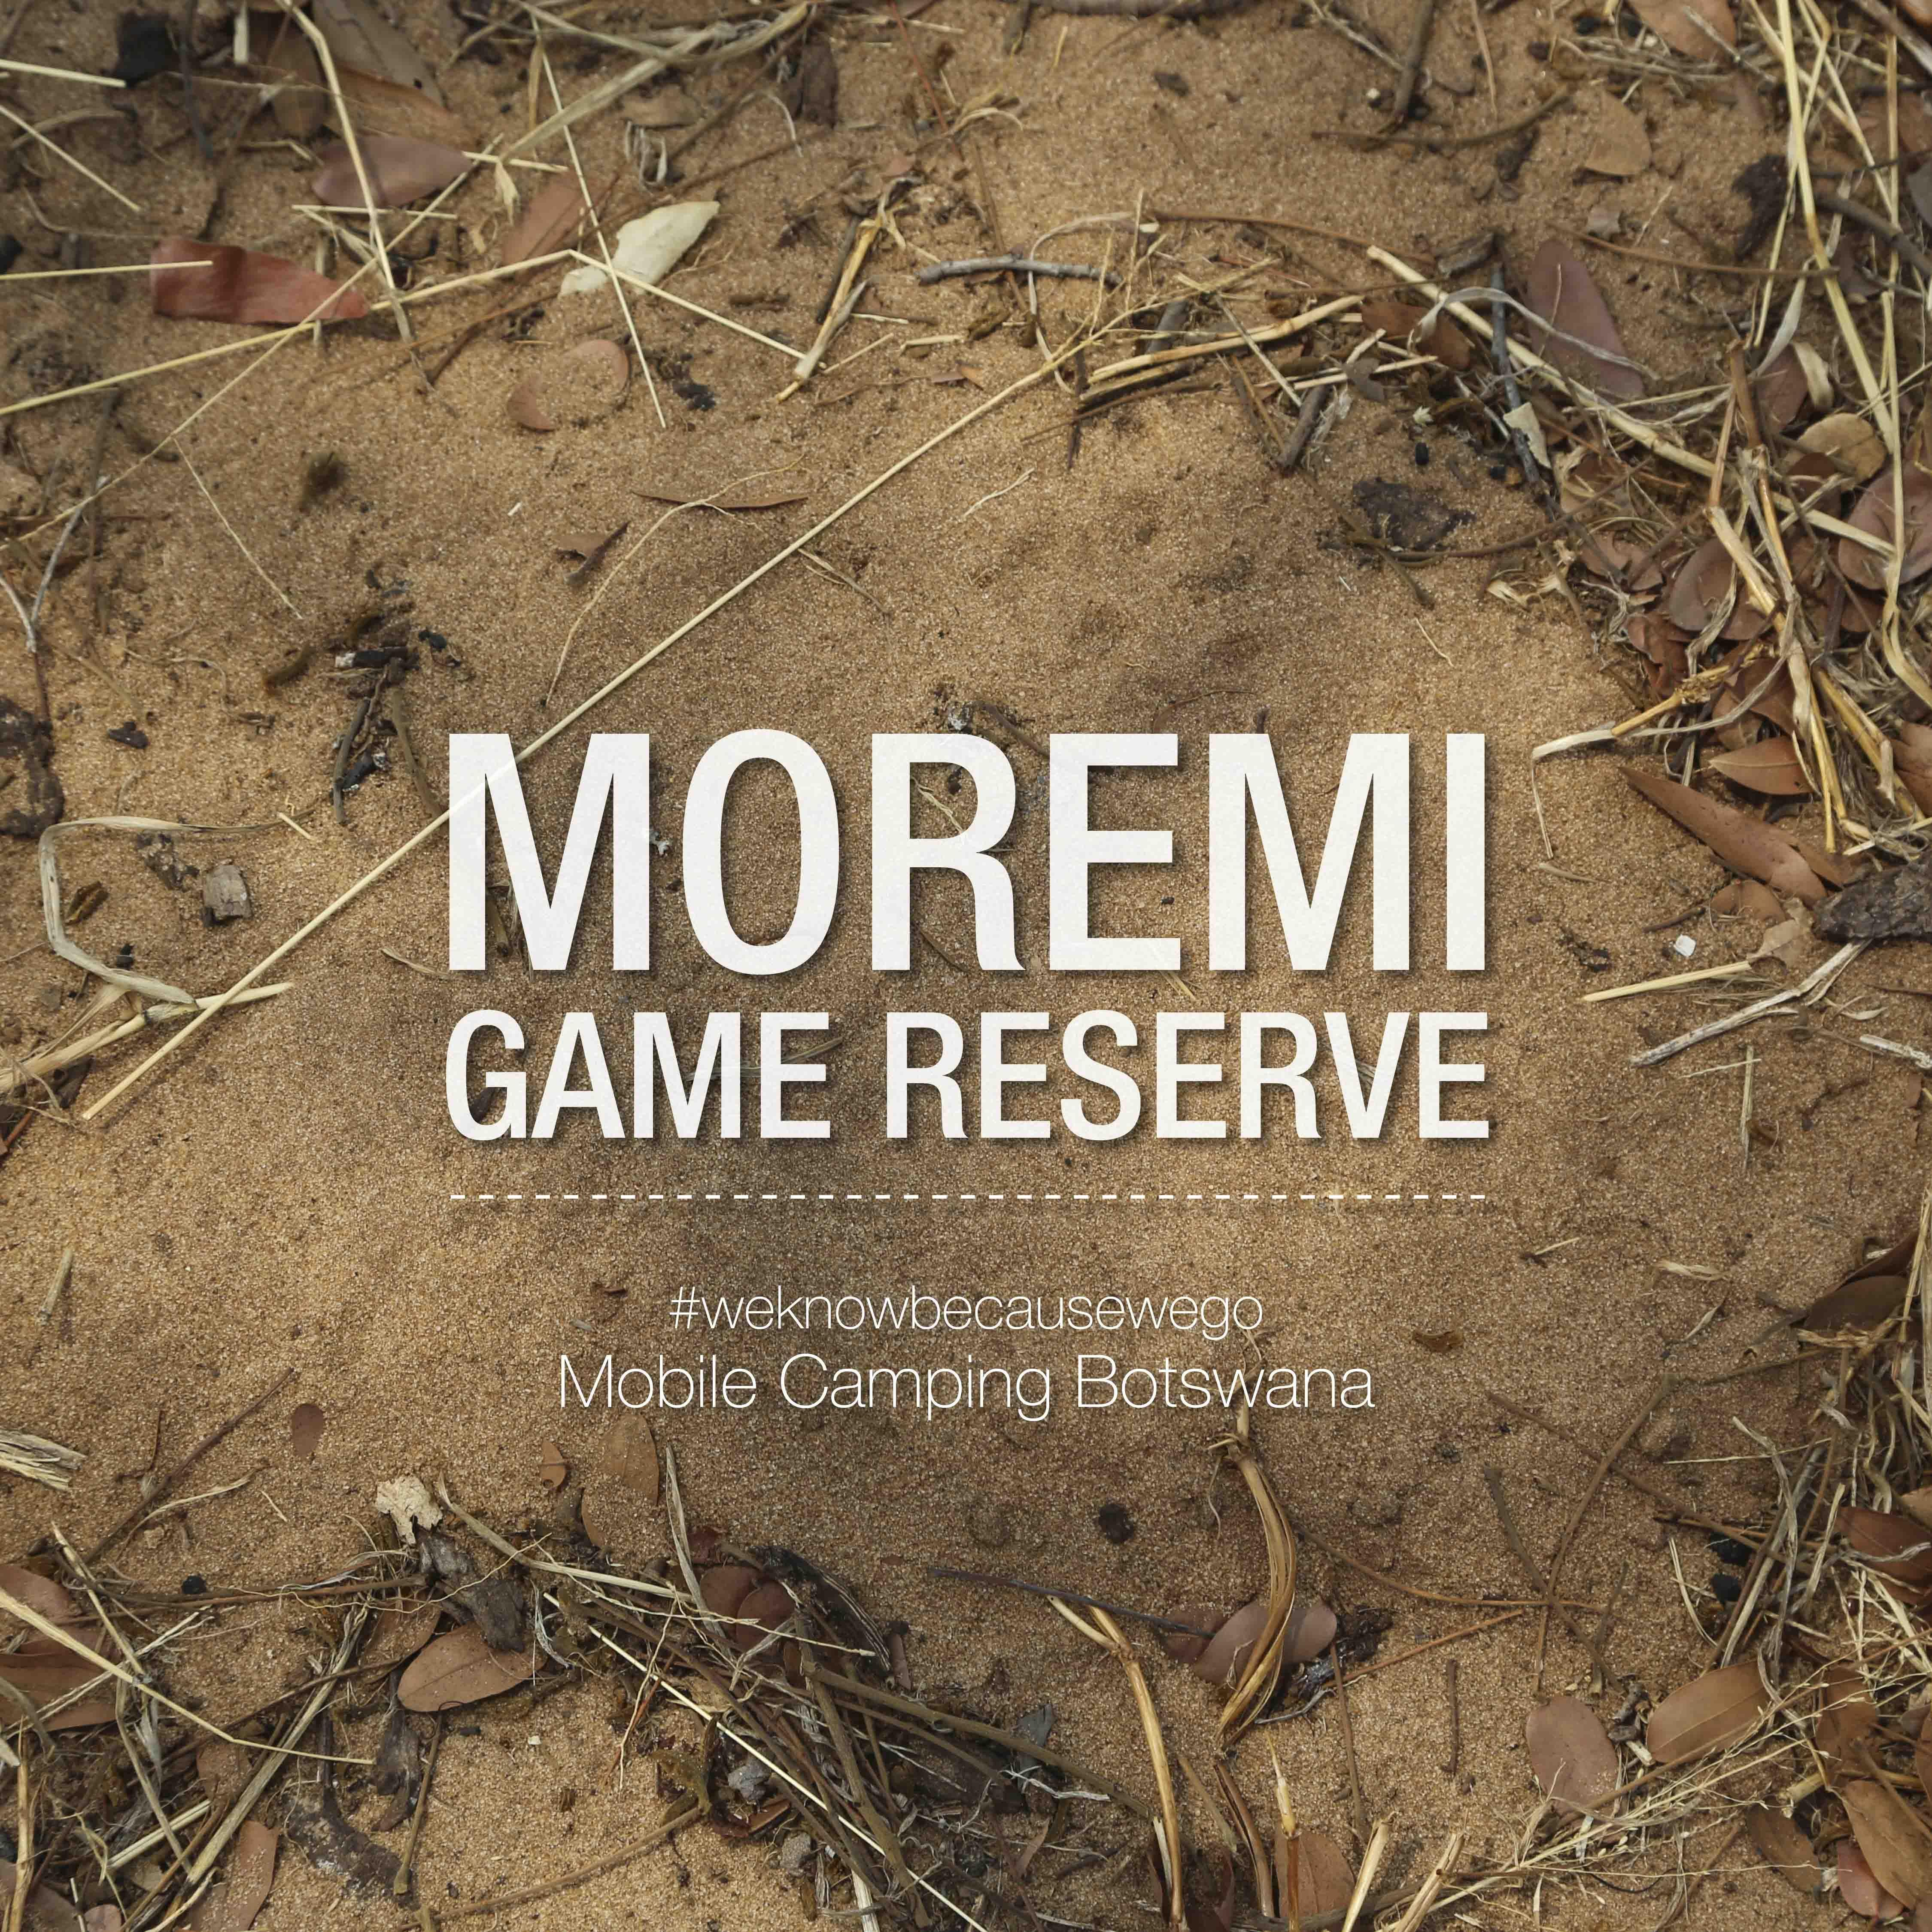 Arriving at Moremi Game Reserve Botswana. Africa